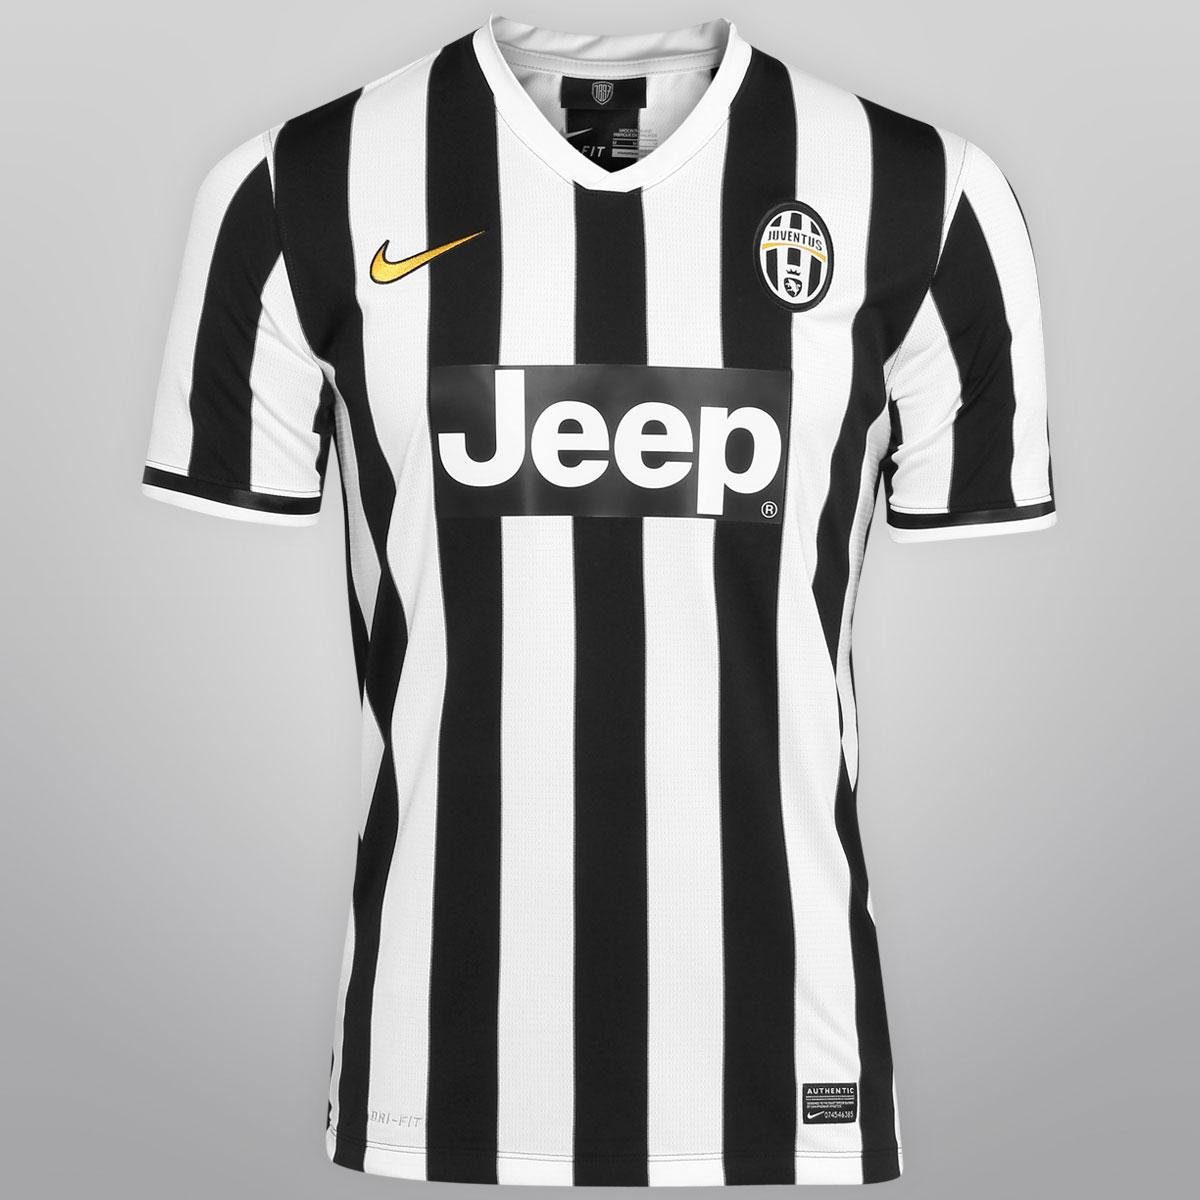 c07002be71 Camisa Nike Juventus Home 13 14 s nº - Compre Agora